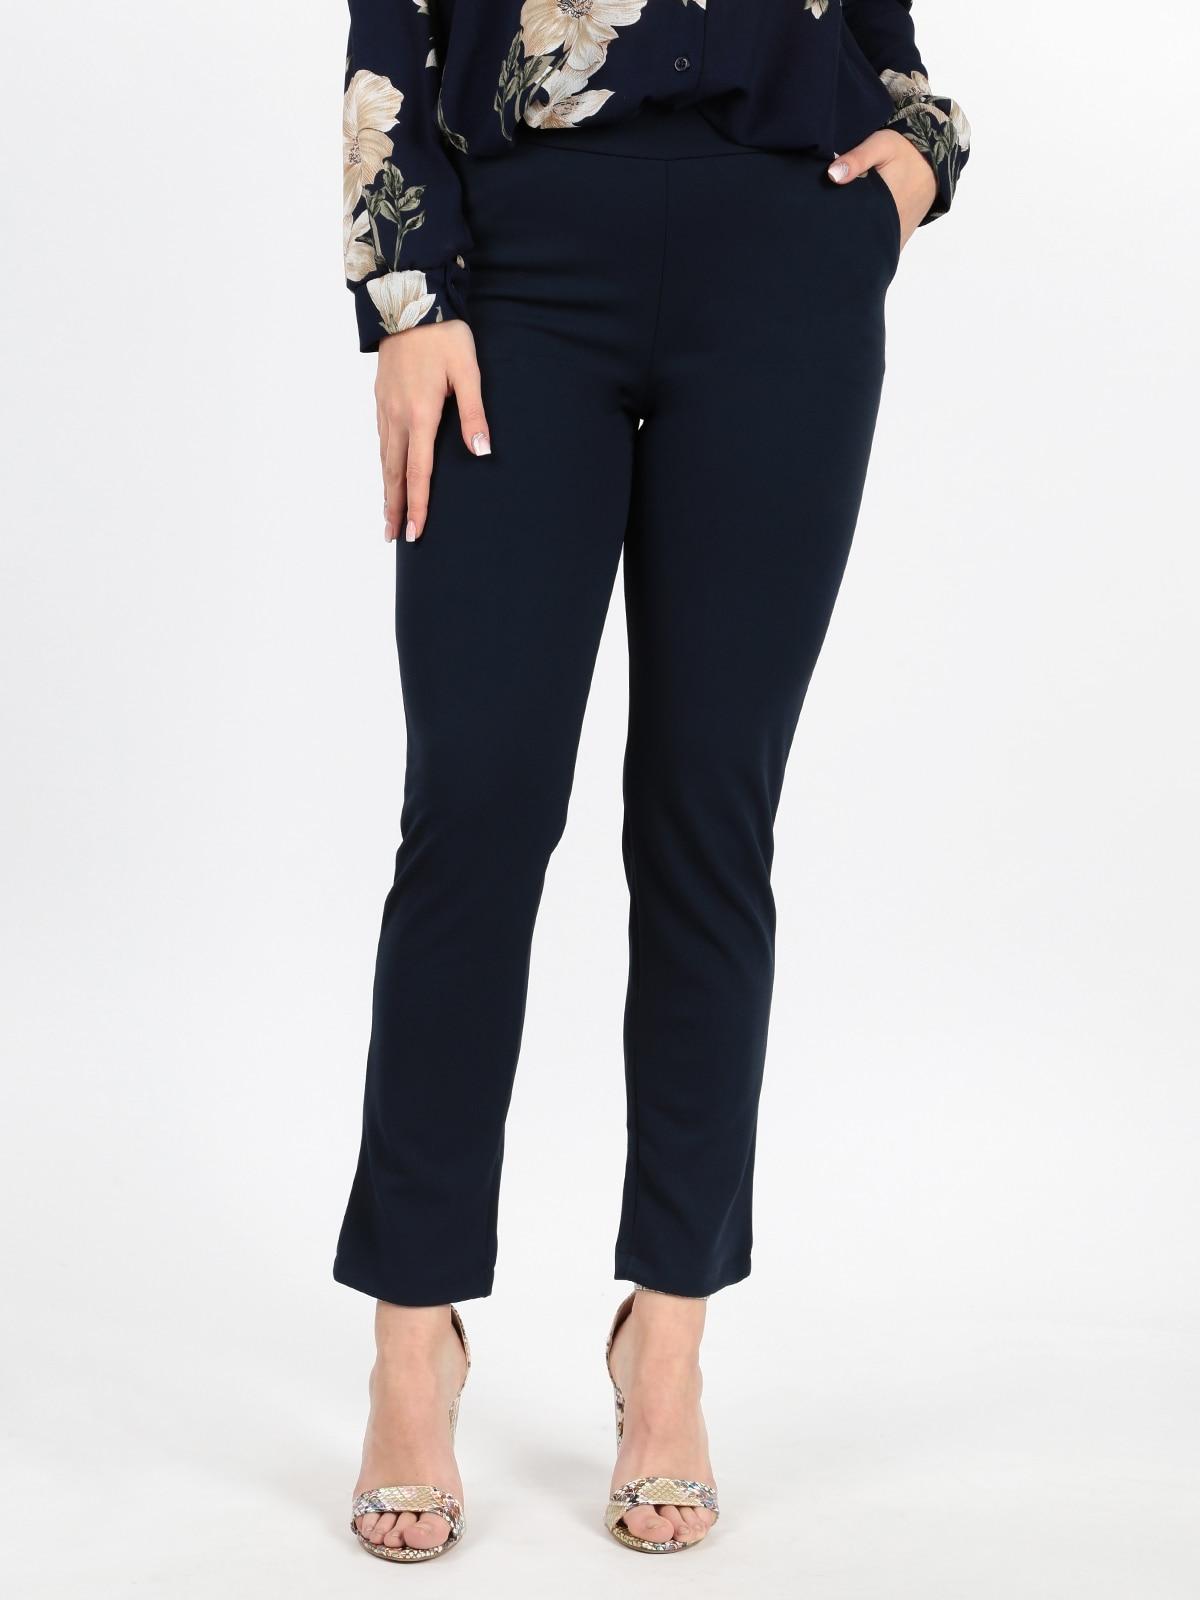 Classic Trousers Women Plus Size